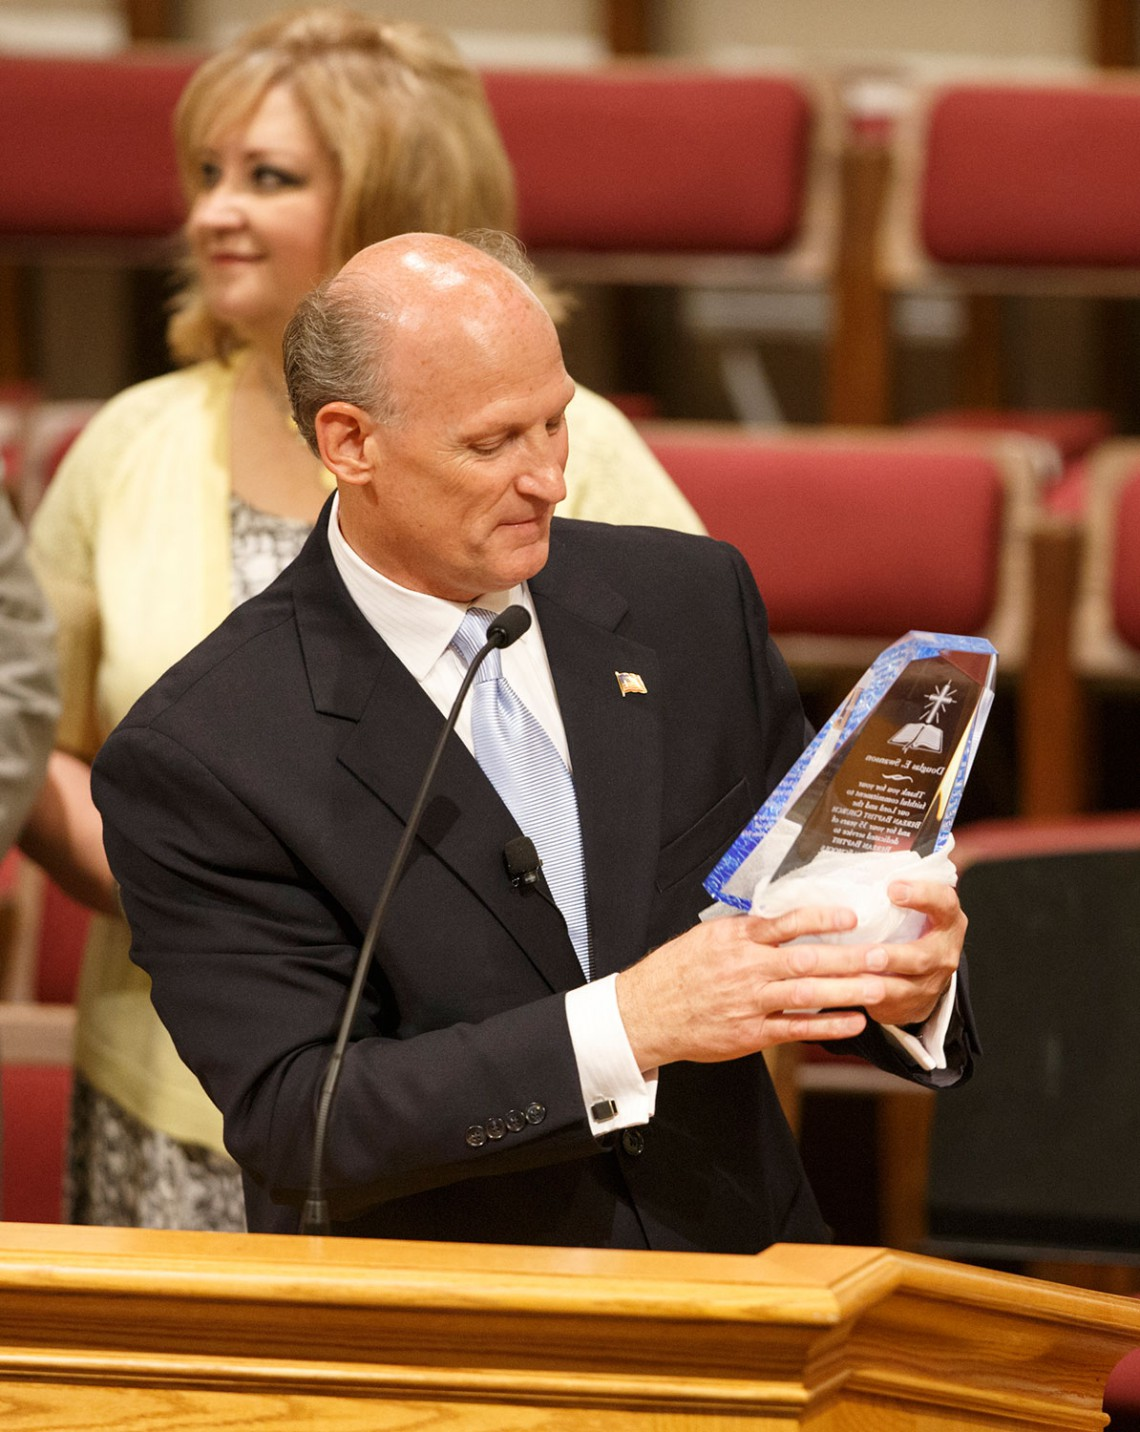 Pastor Presents Award